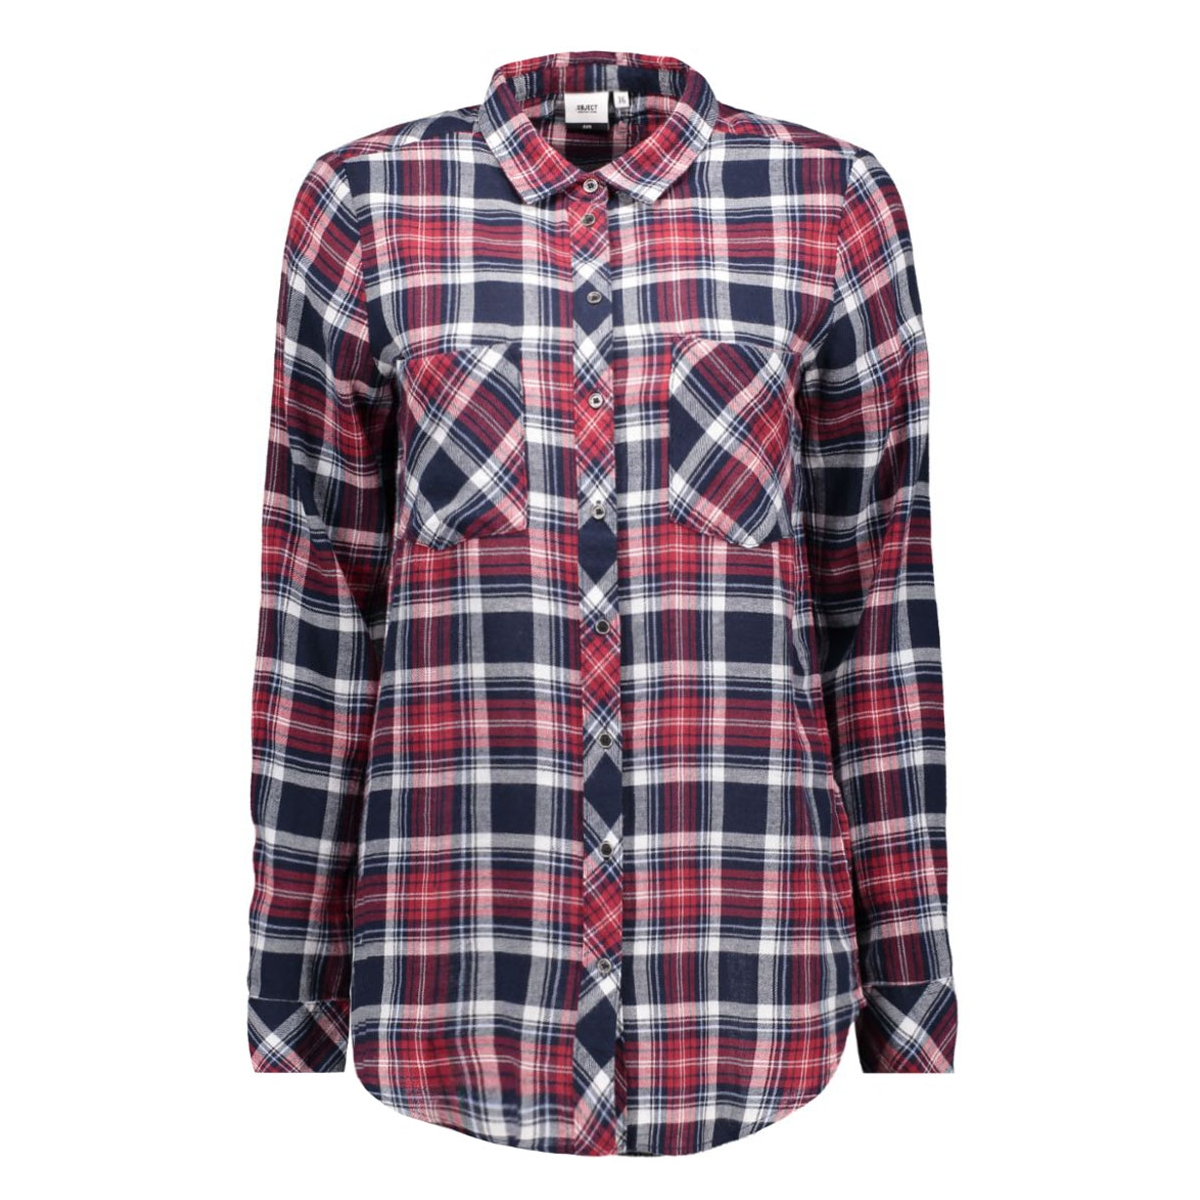 objblueberry l/s shirt 23020704 object blouse sky captain